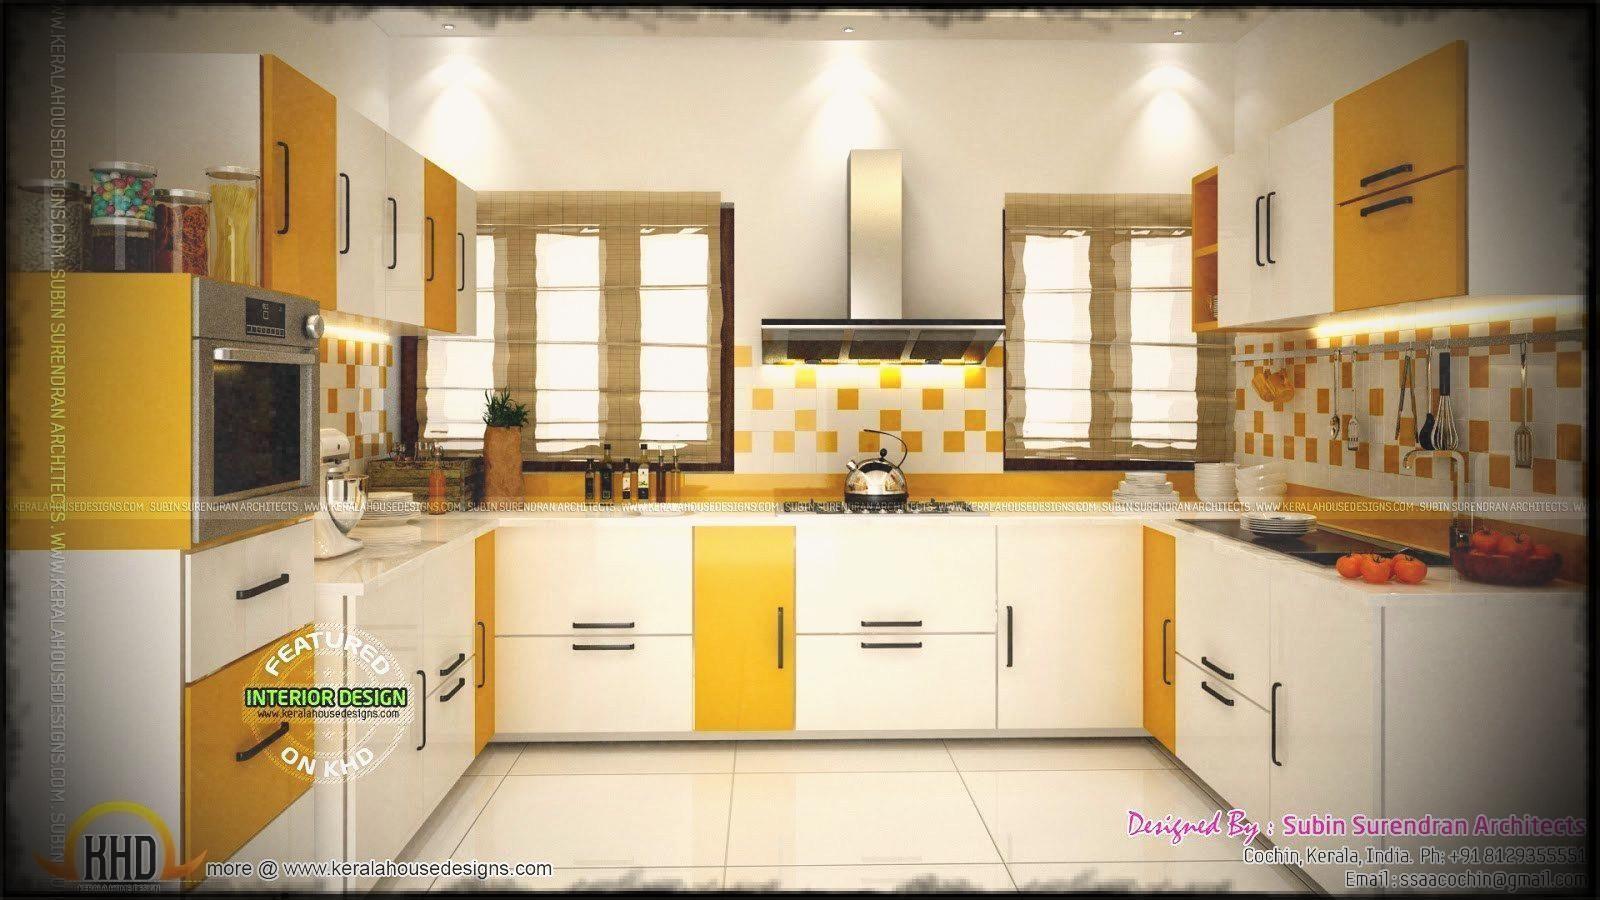 Pin by Vijayjeya on jeya in 9   Interior design kitchen, Modern ...